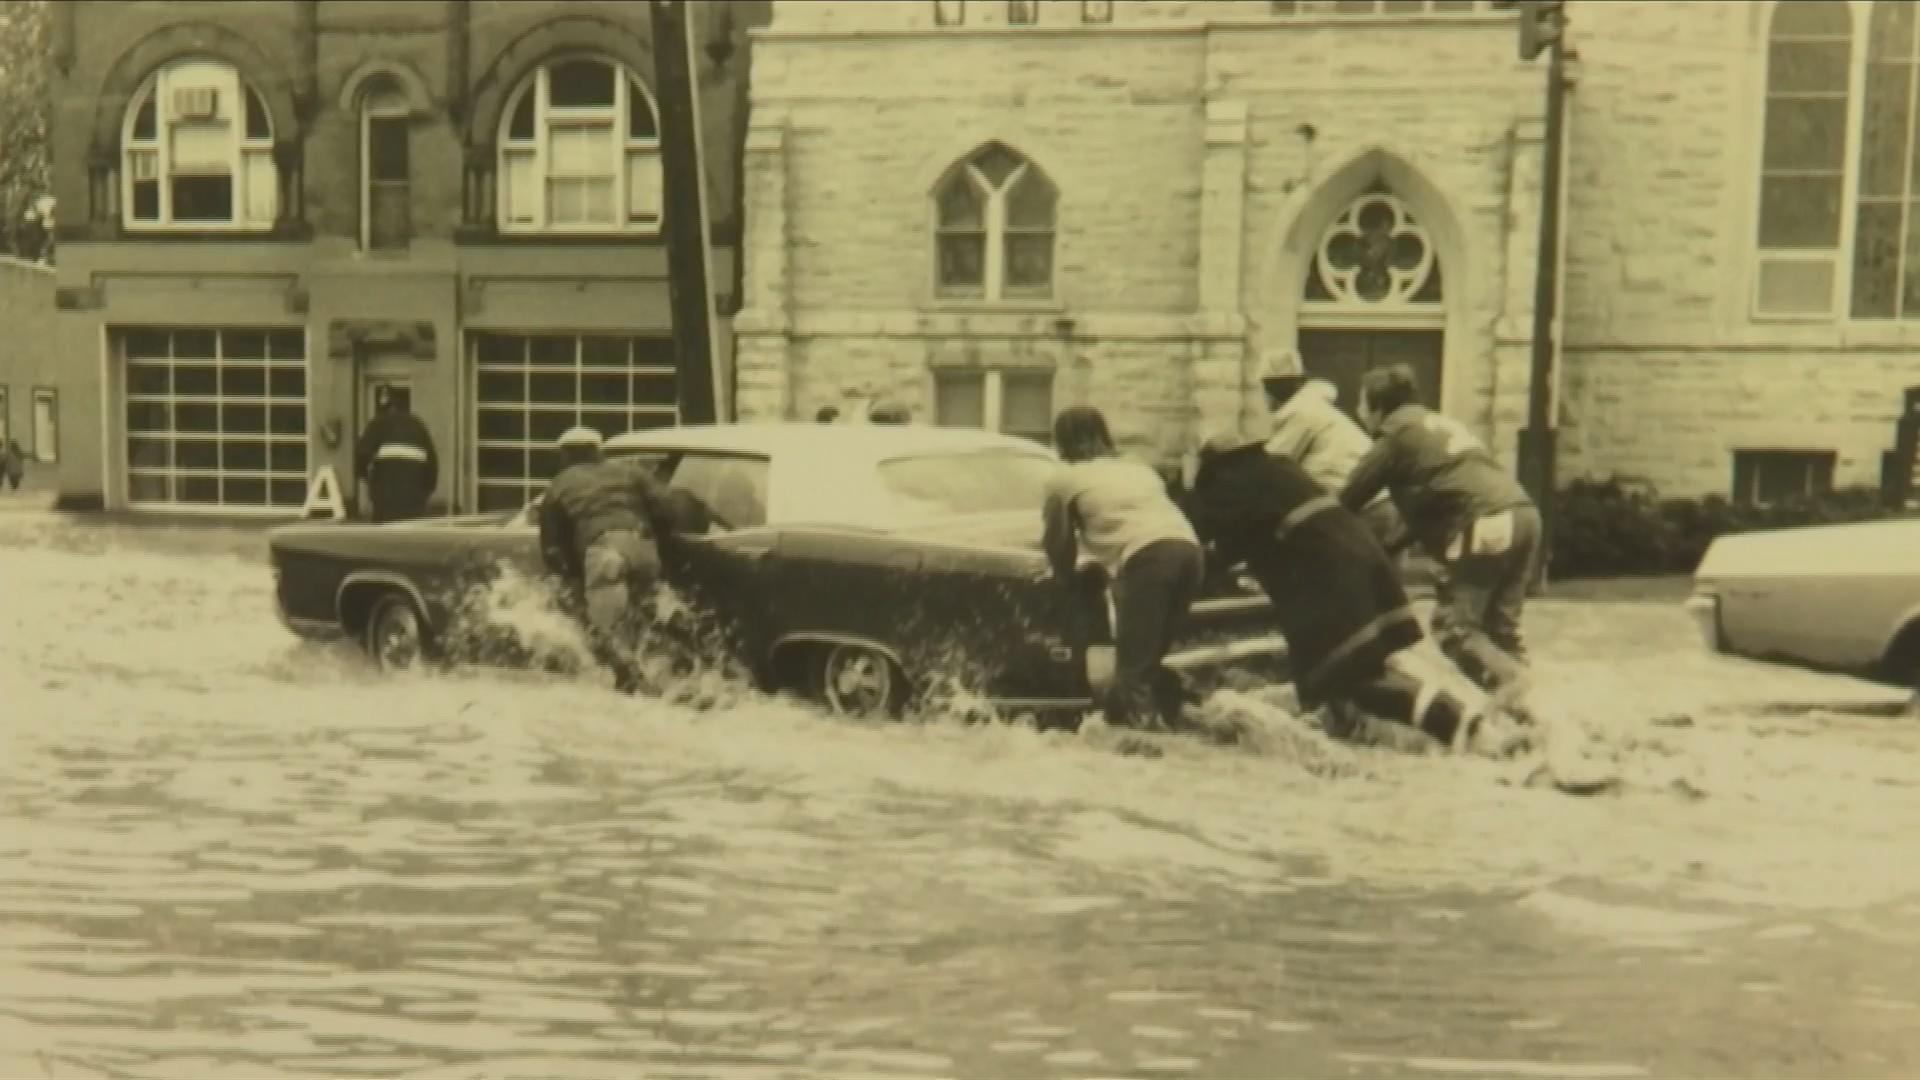 Flood of 72